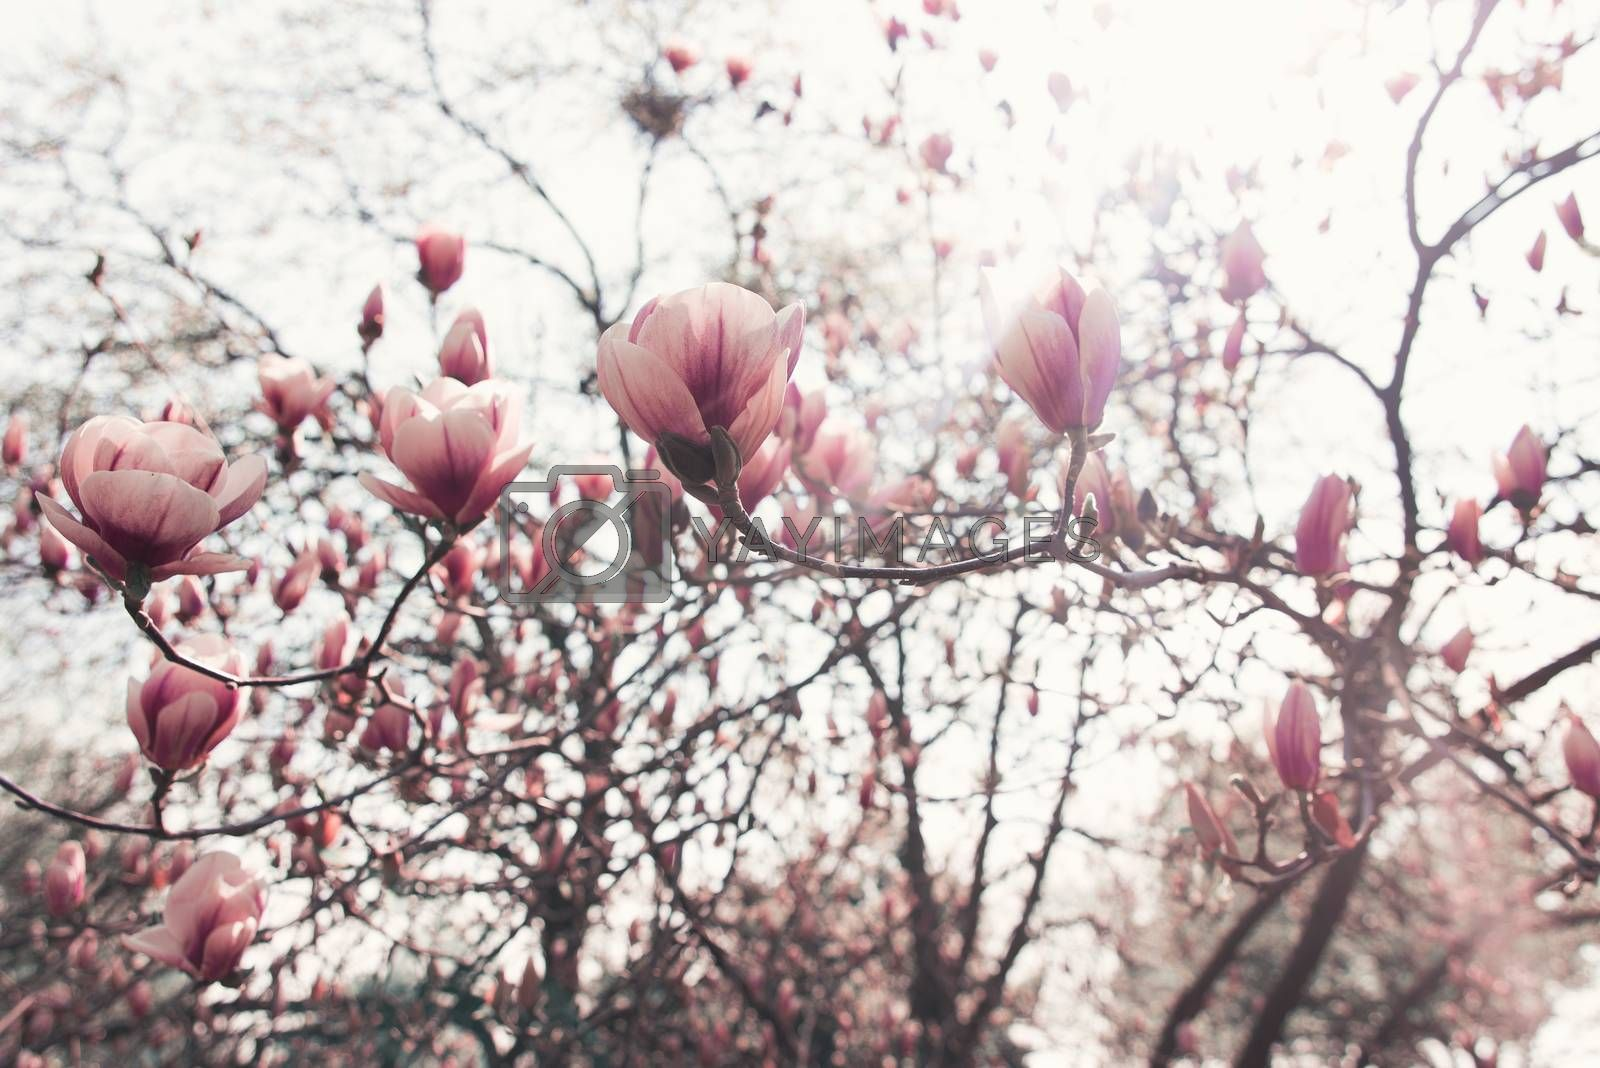 Magnolia trees, Botanical Garden spring atmosphere, good mood